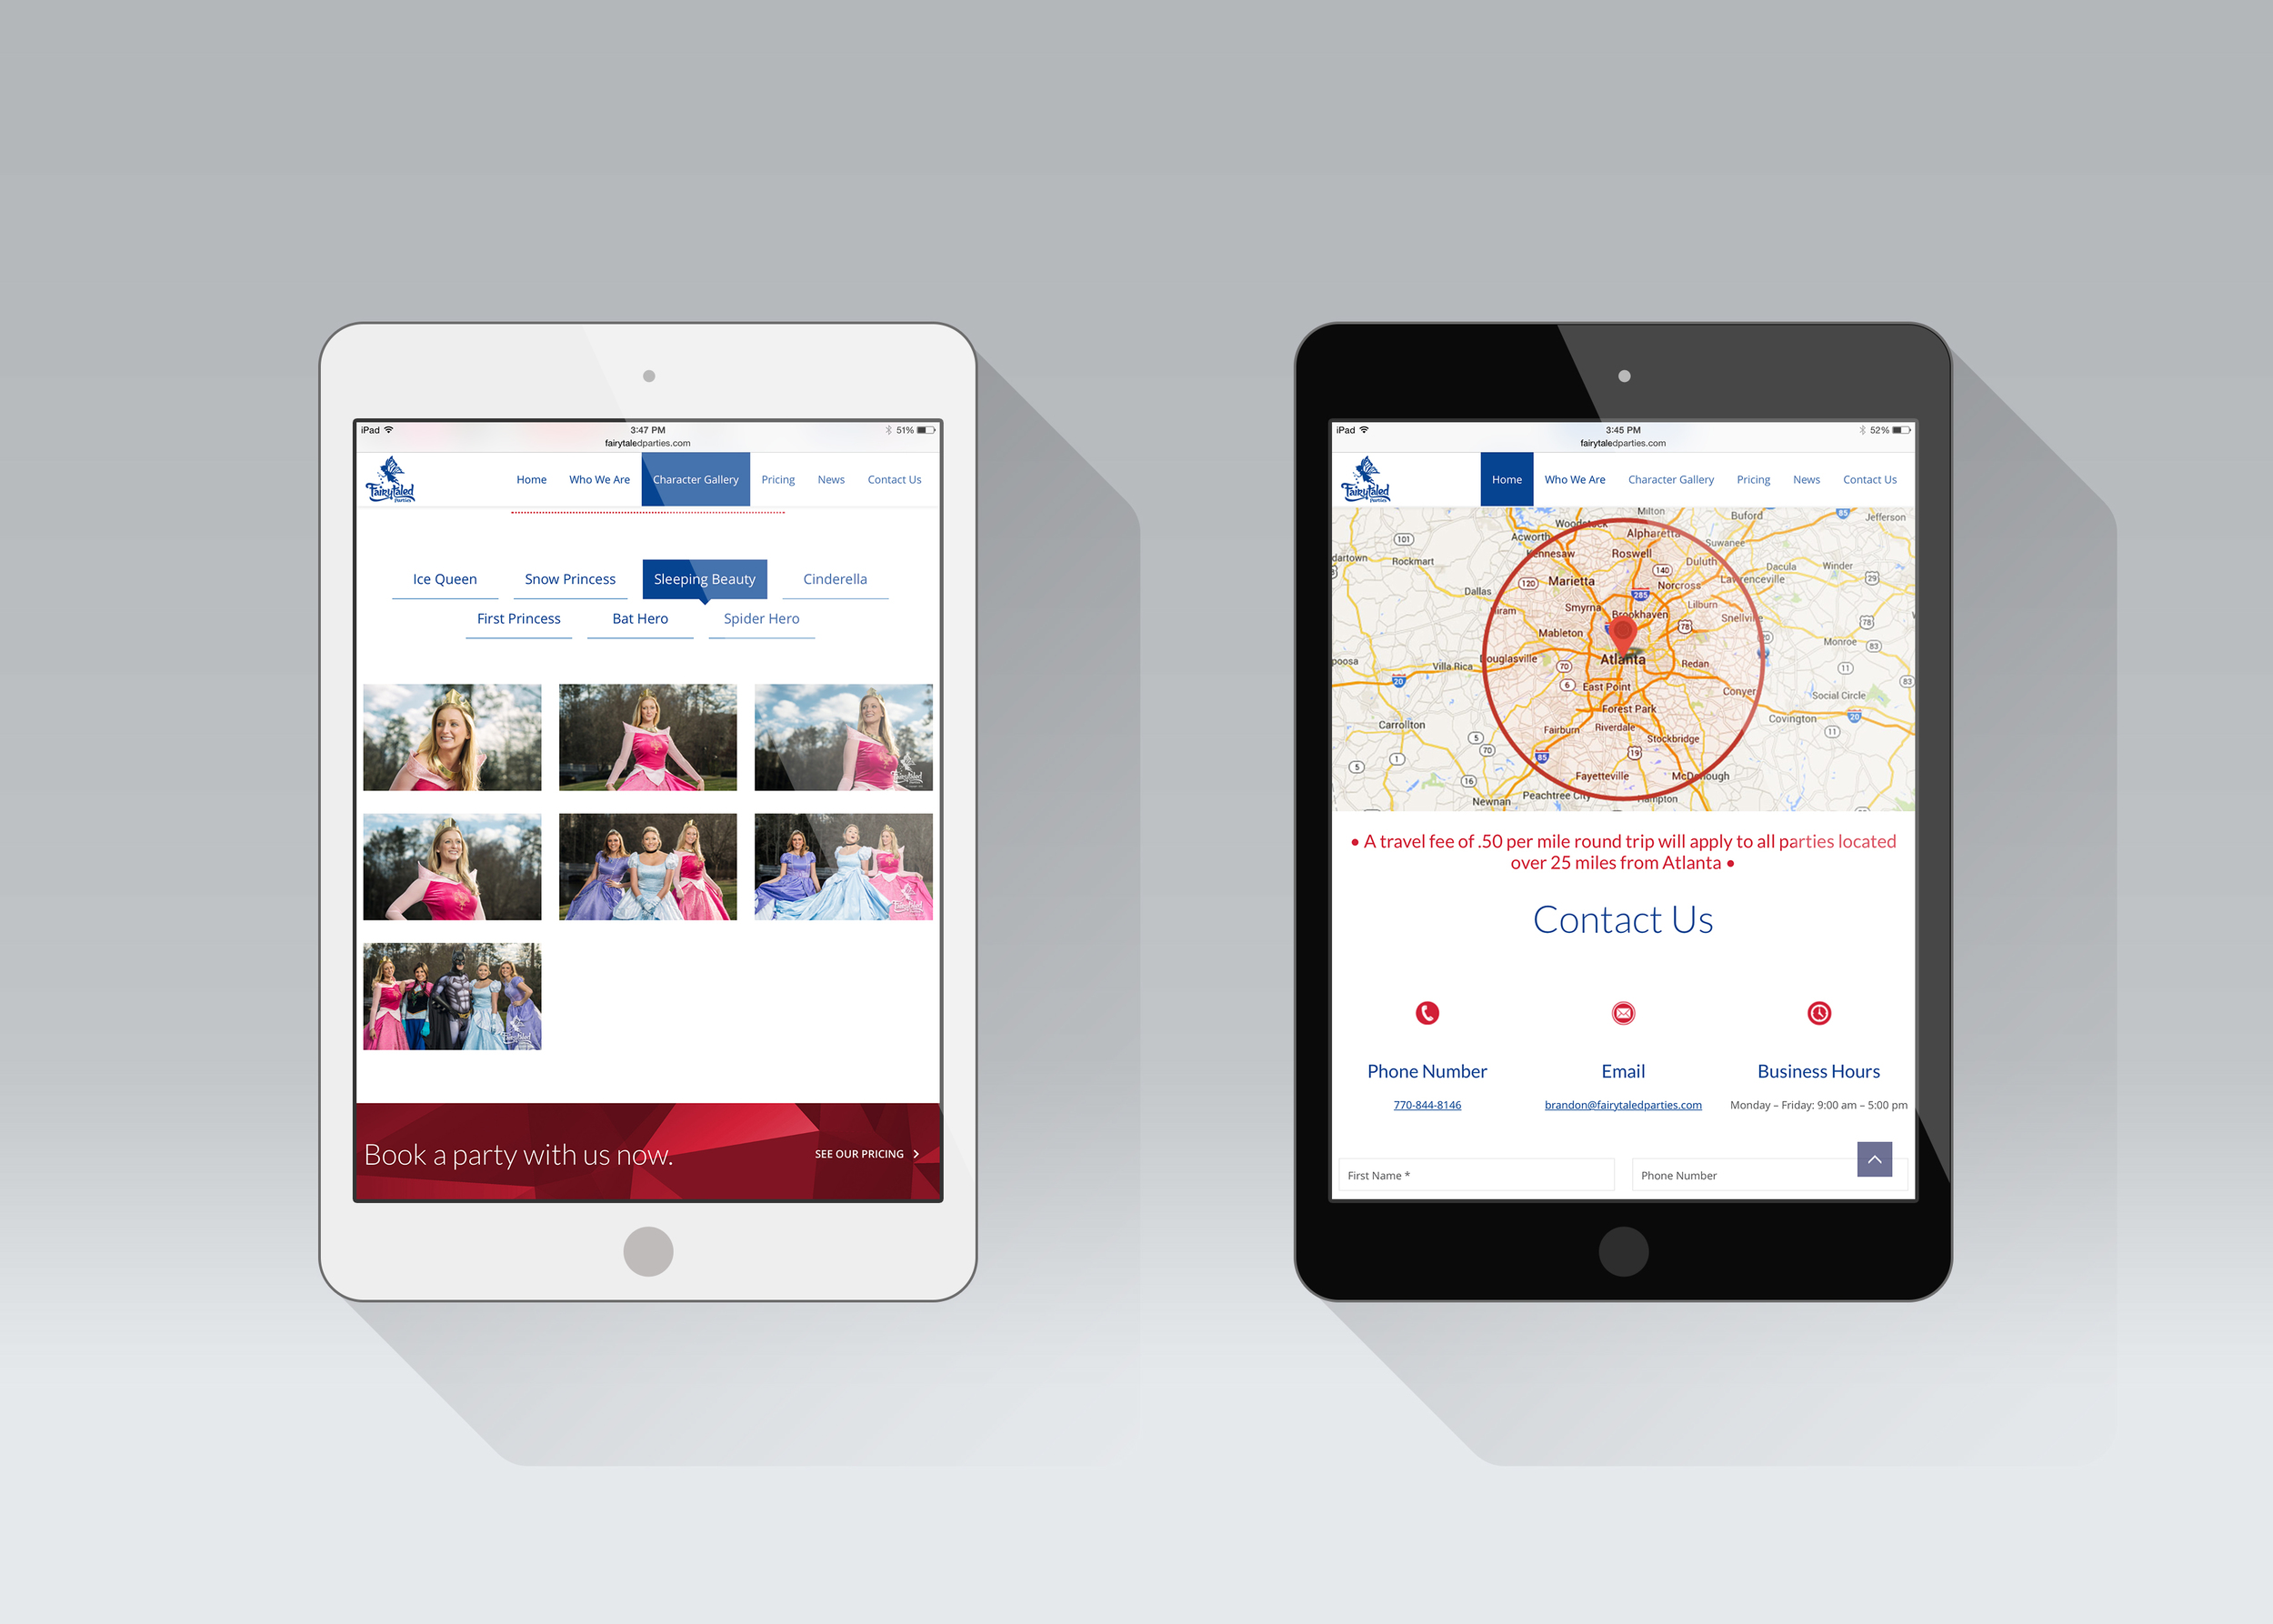 FP_iPad-2.jpg